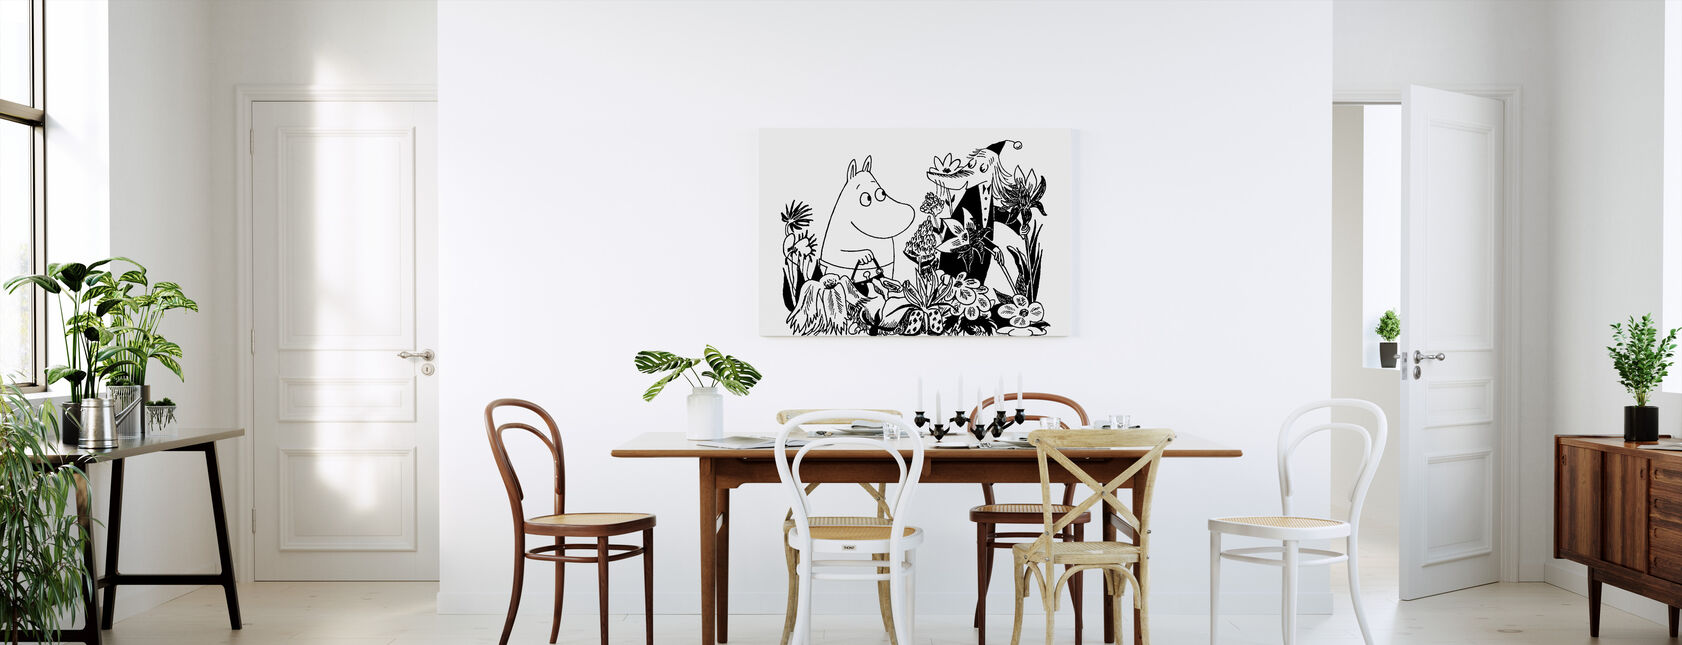 Moominmamma et Fillyjonk - Impression sur toile - Cuisine